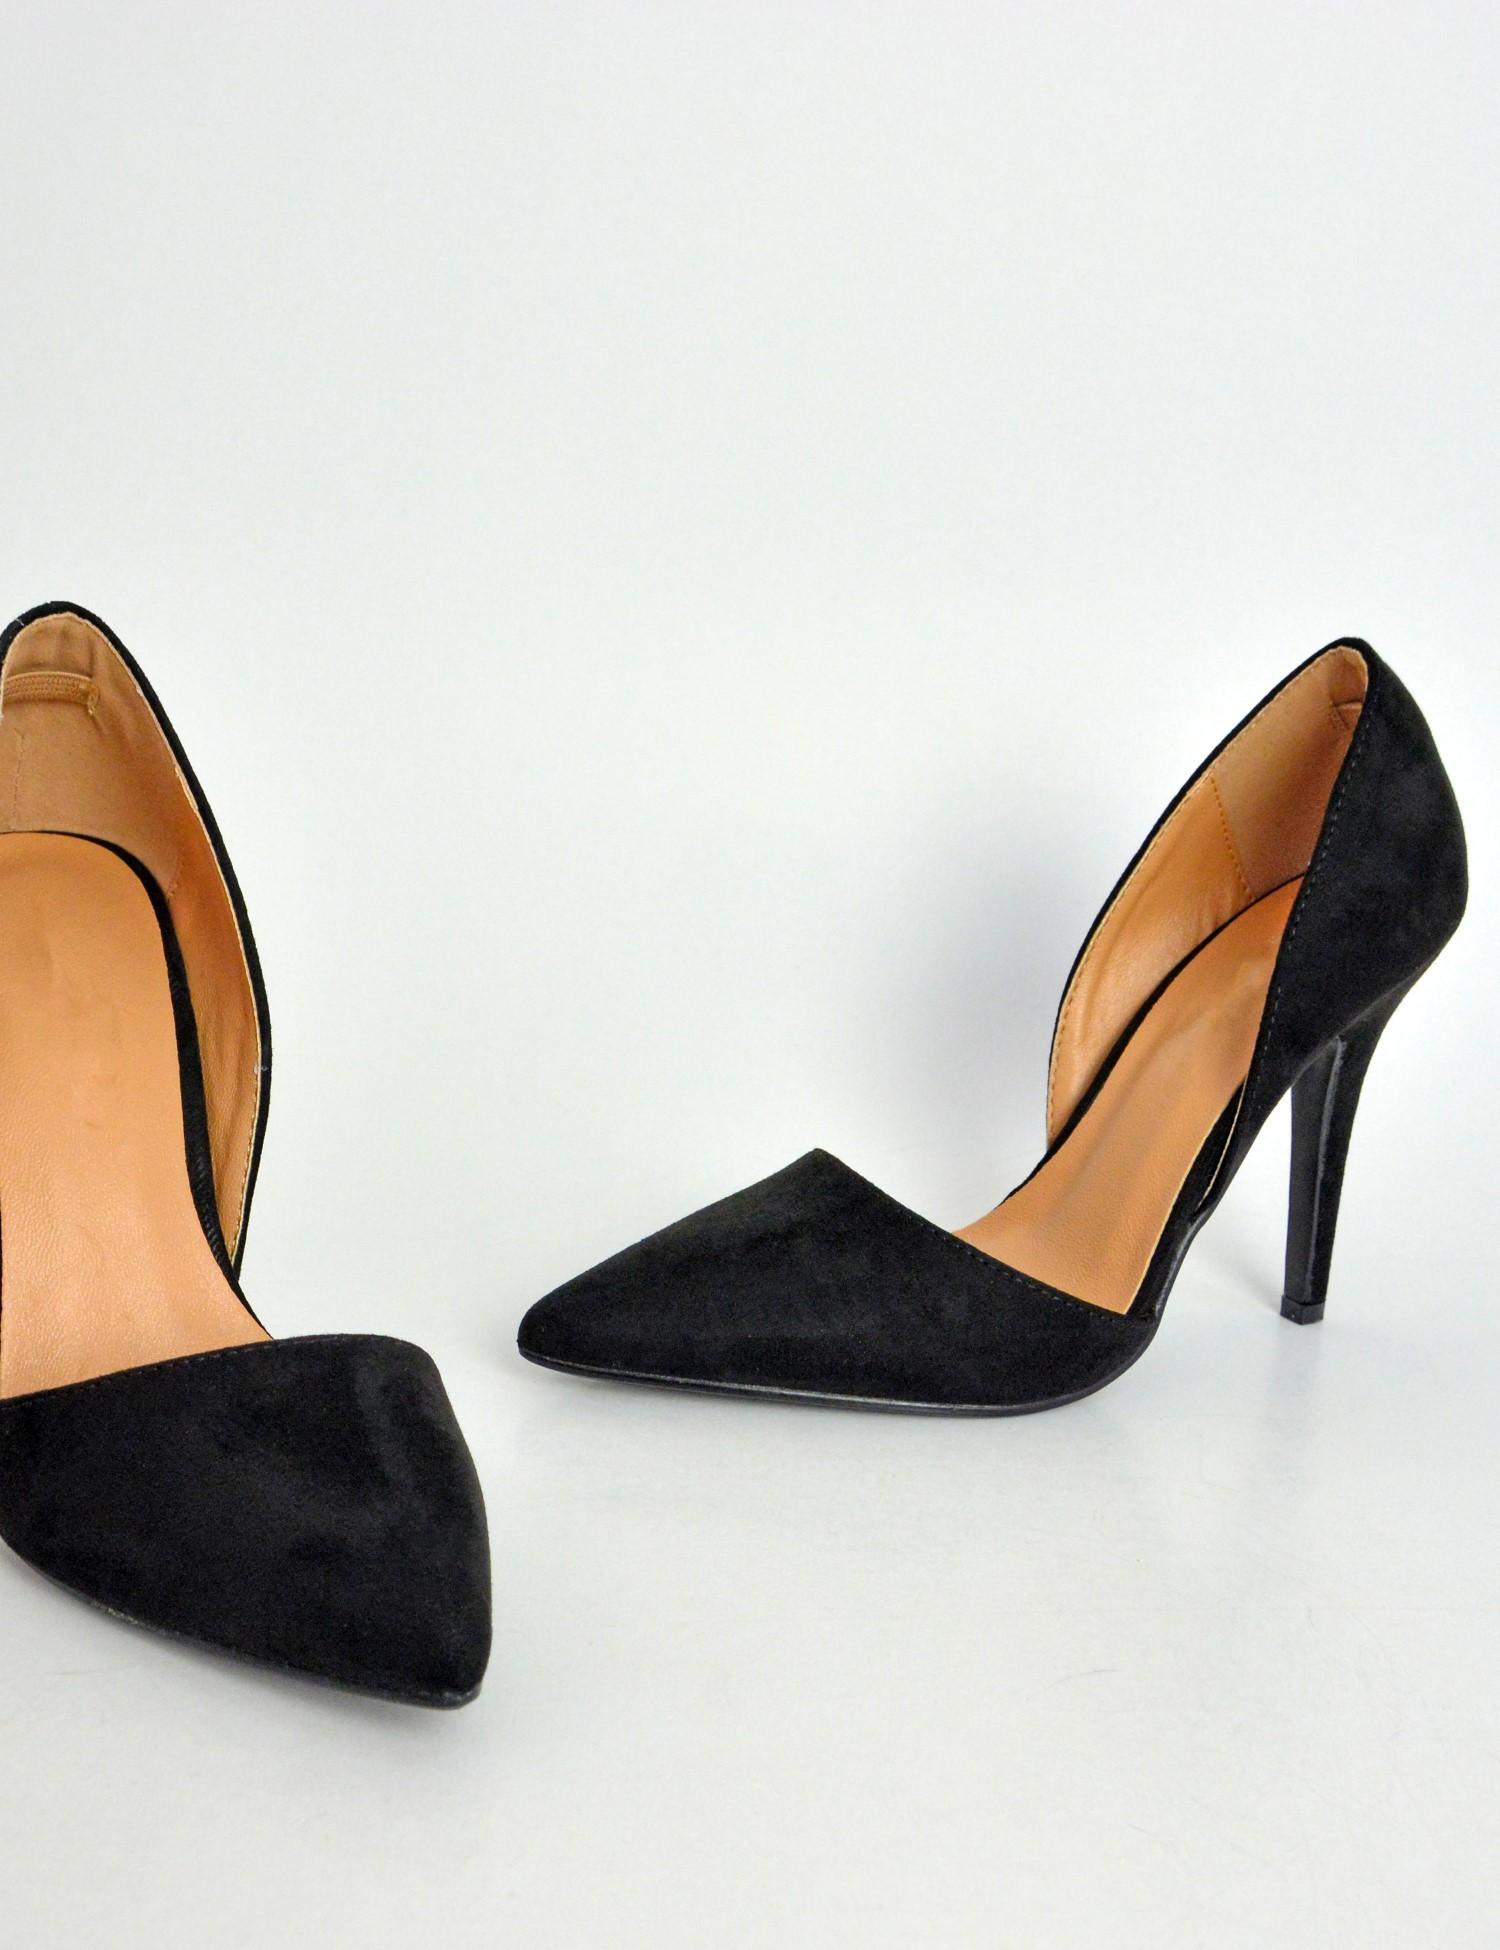 55a89fa0ca Γυναικείες σουέντ μυτερές γόβες μαύρες με άνοιγμα LBS2030C